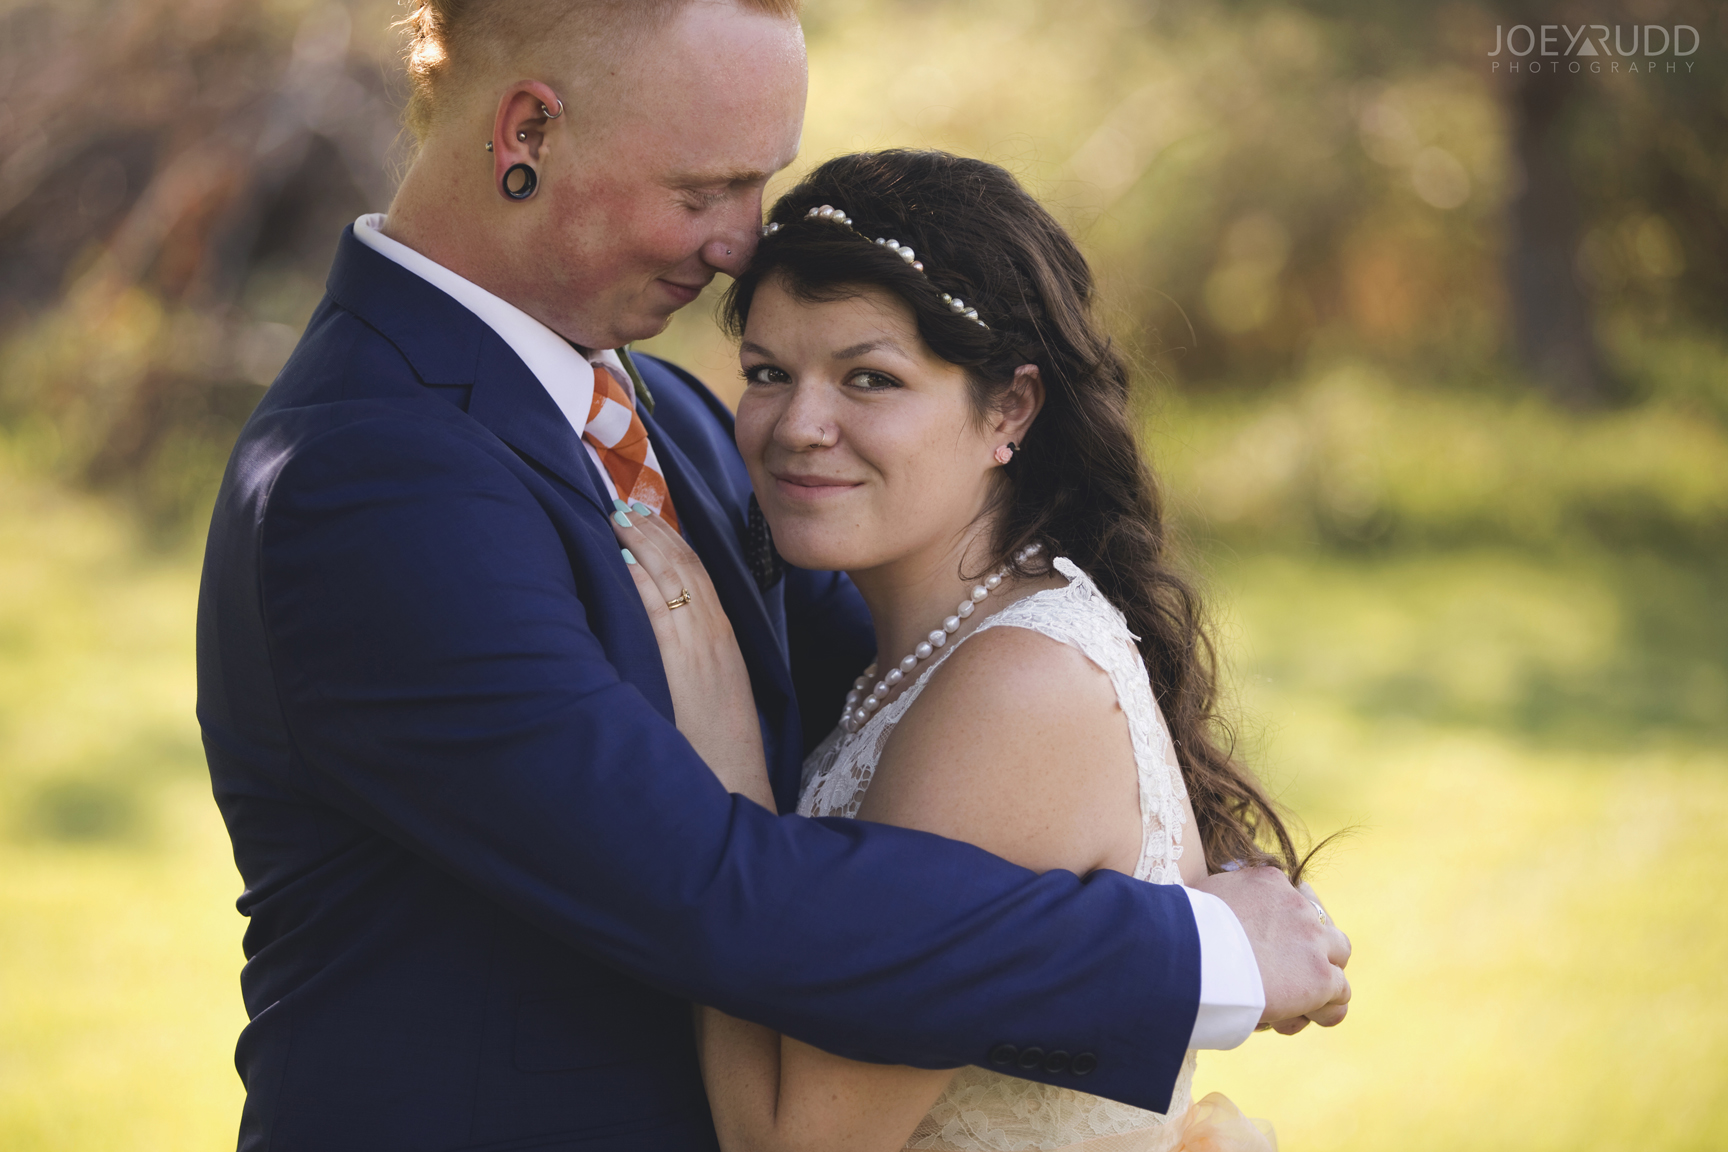 Backyard Kingston Wedding by Ottawa Wedding Photographer Joey Rudd Photography Couple Pose